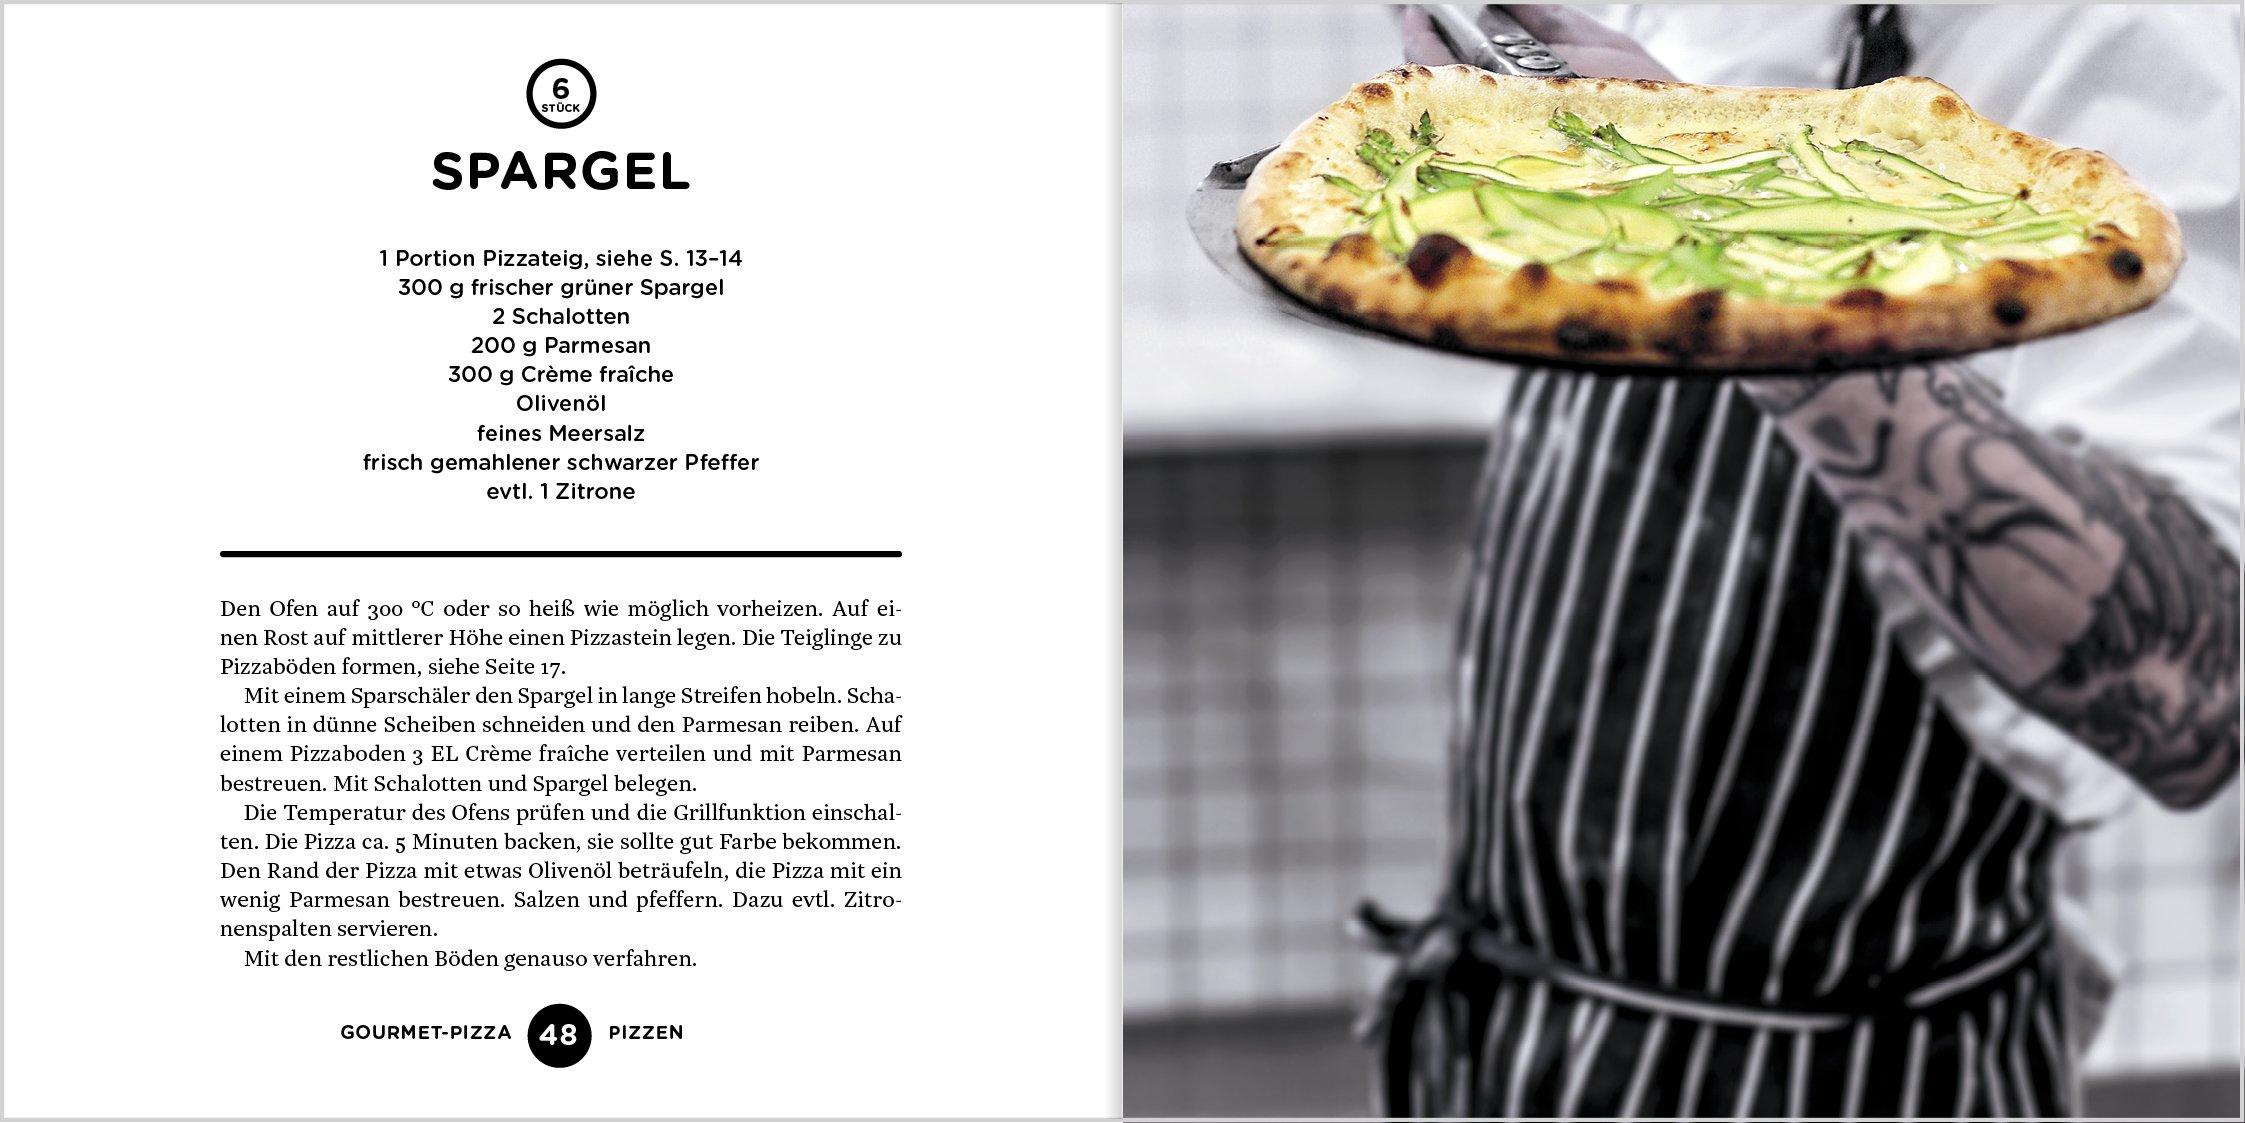 gourmet pizza håkan johansson